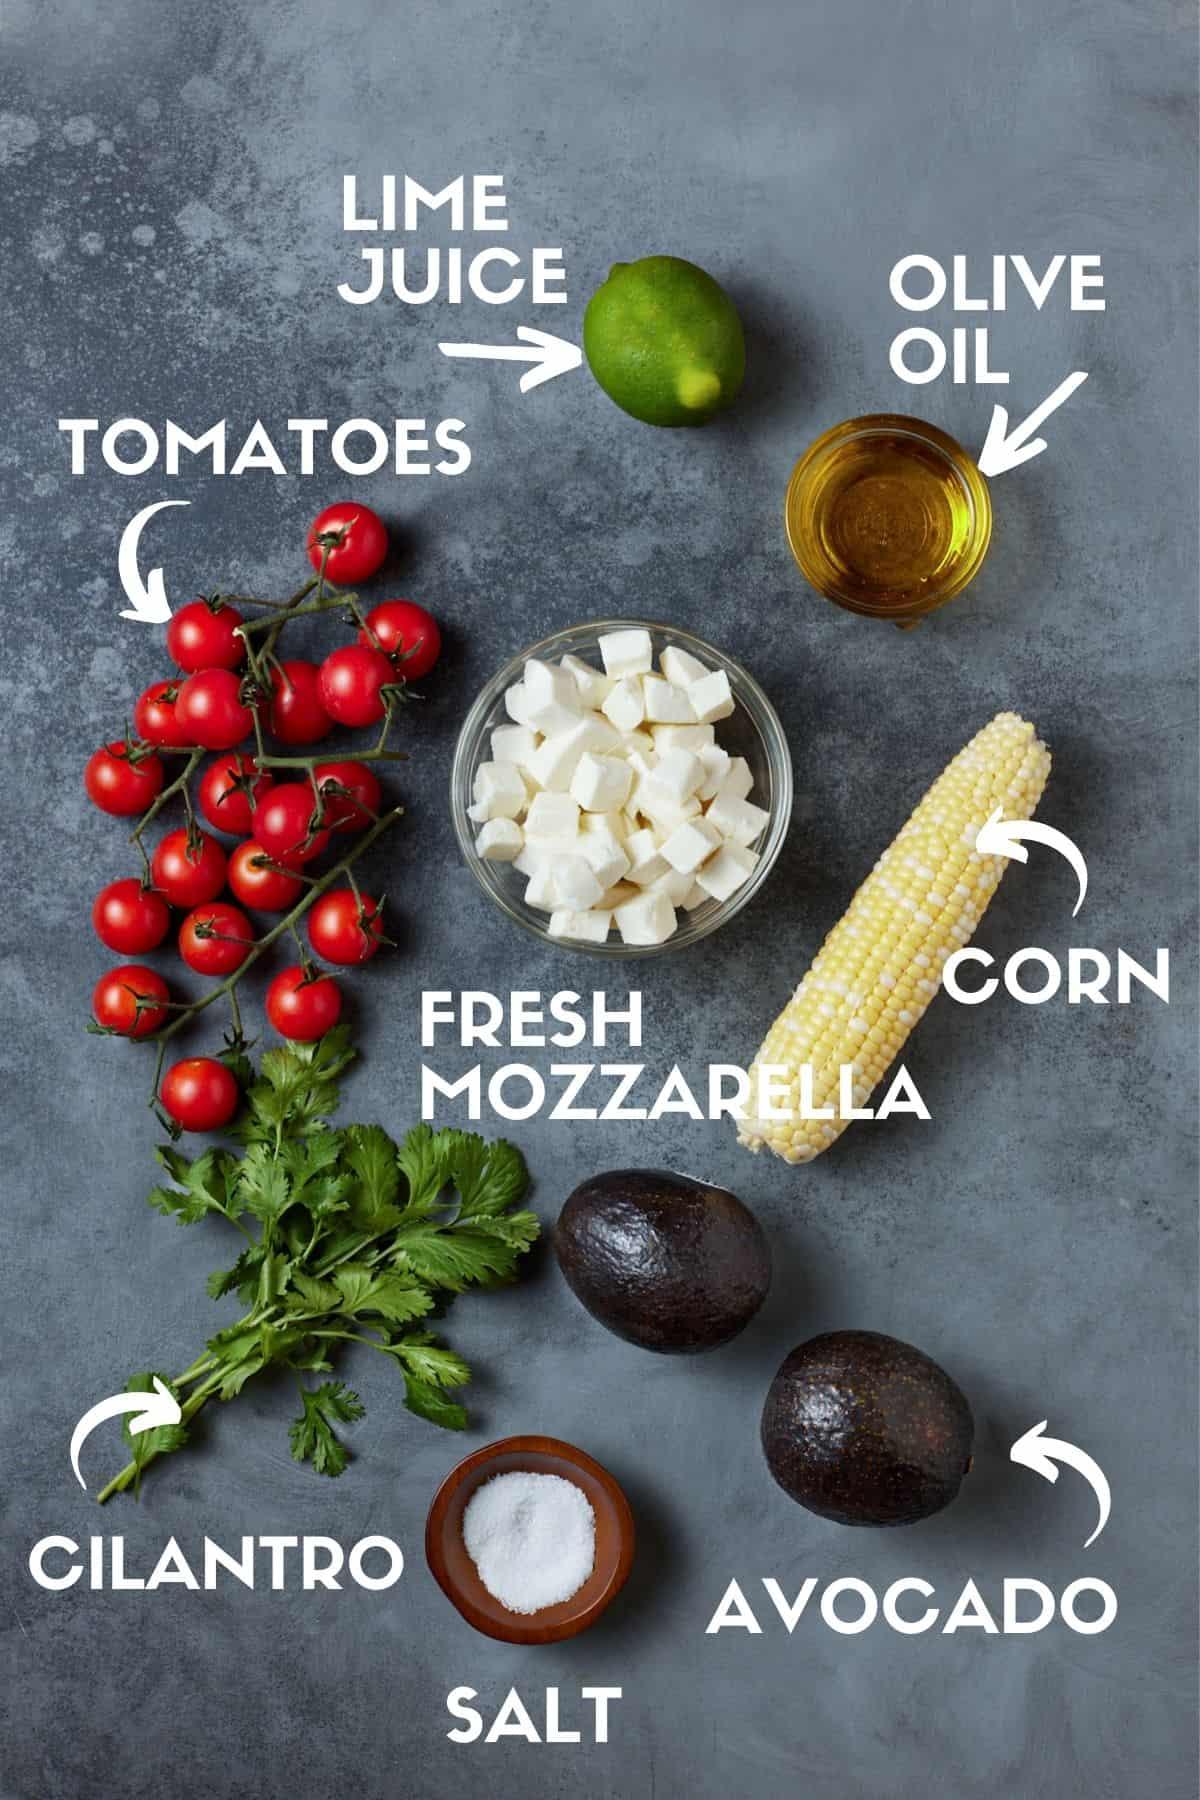 Ingredients for Corn Avocado Salad, including tomatoes, fresh mozzarella and cilantro.